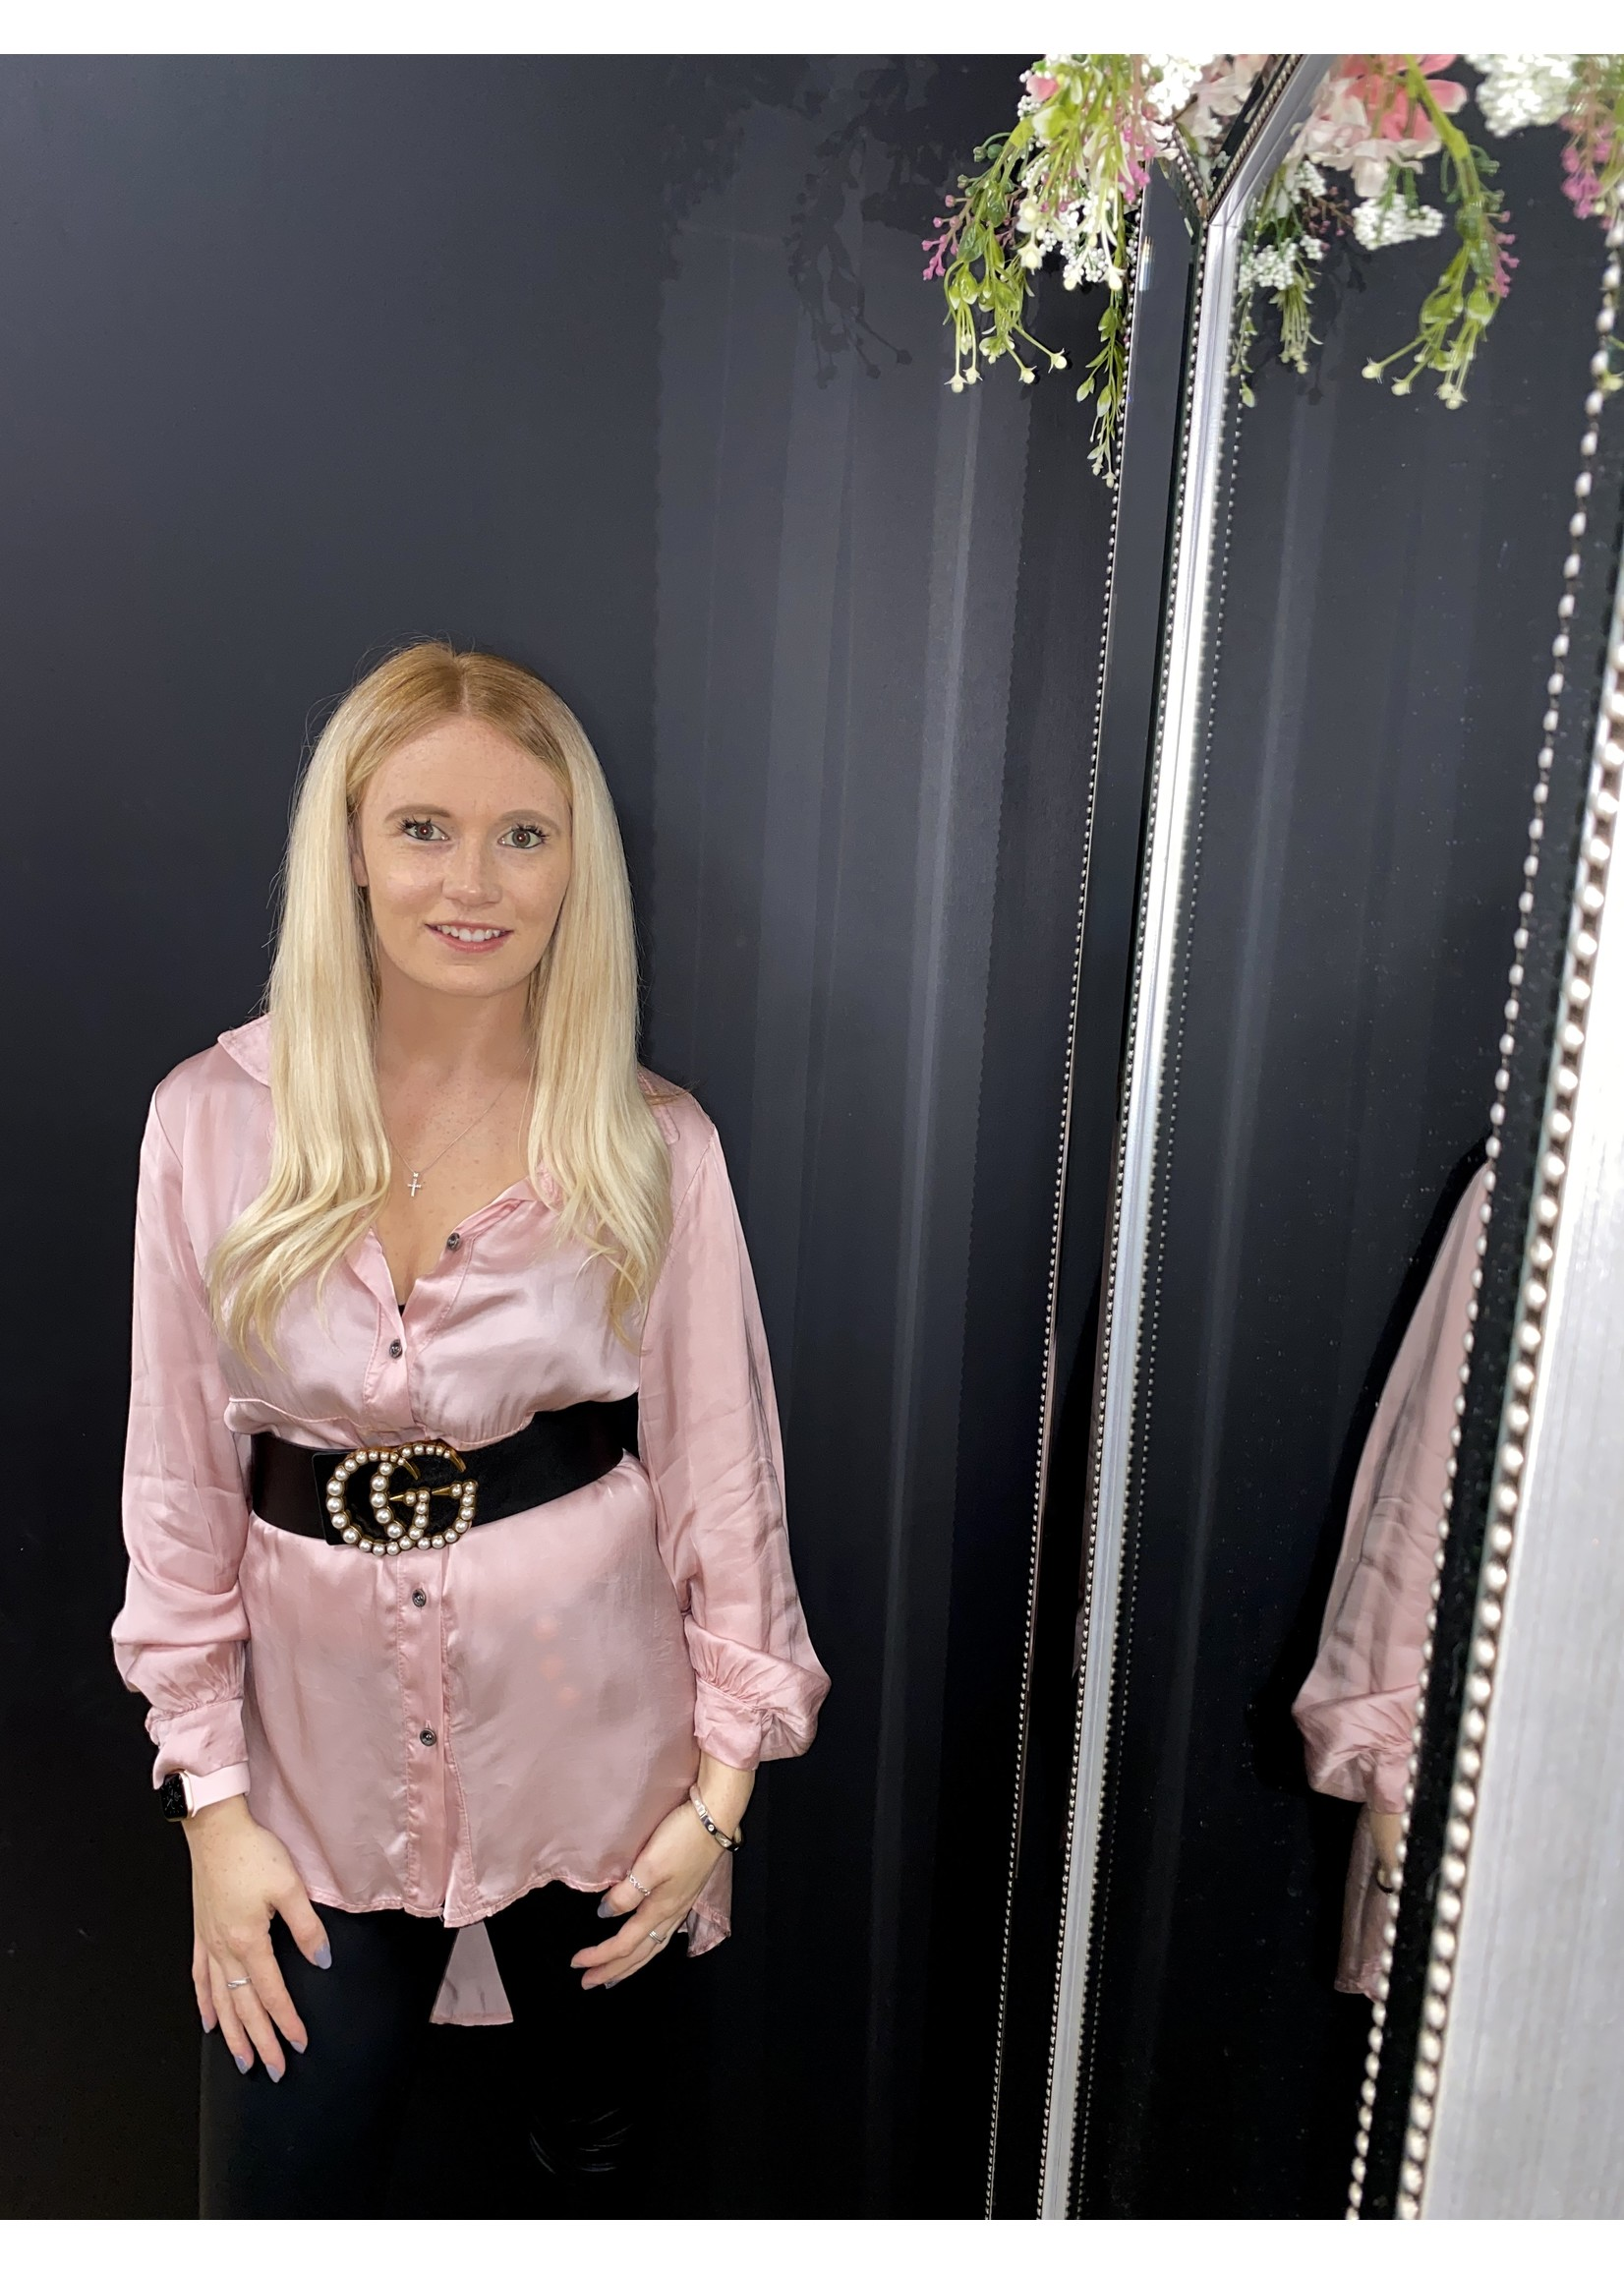 Sabrina oversized silky shirt